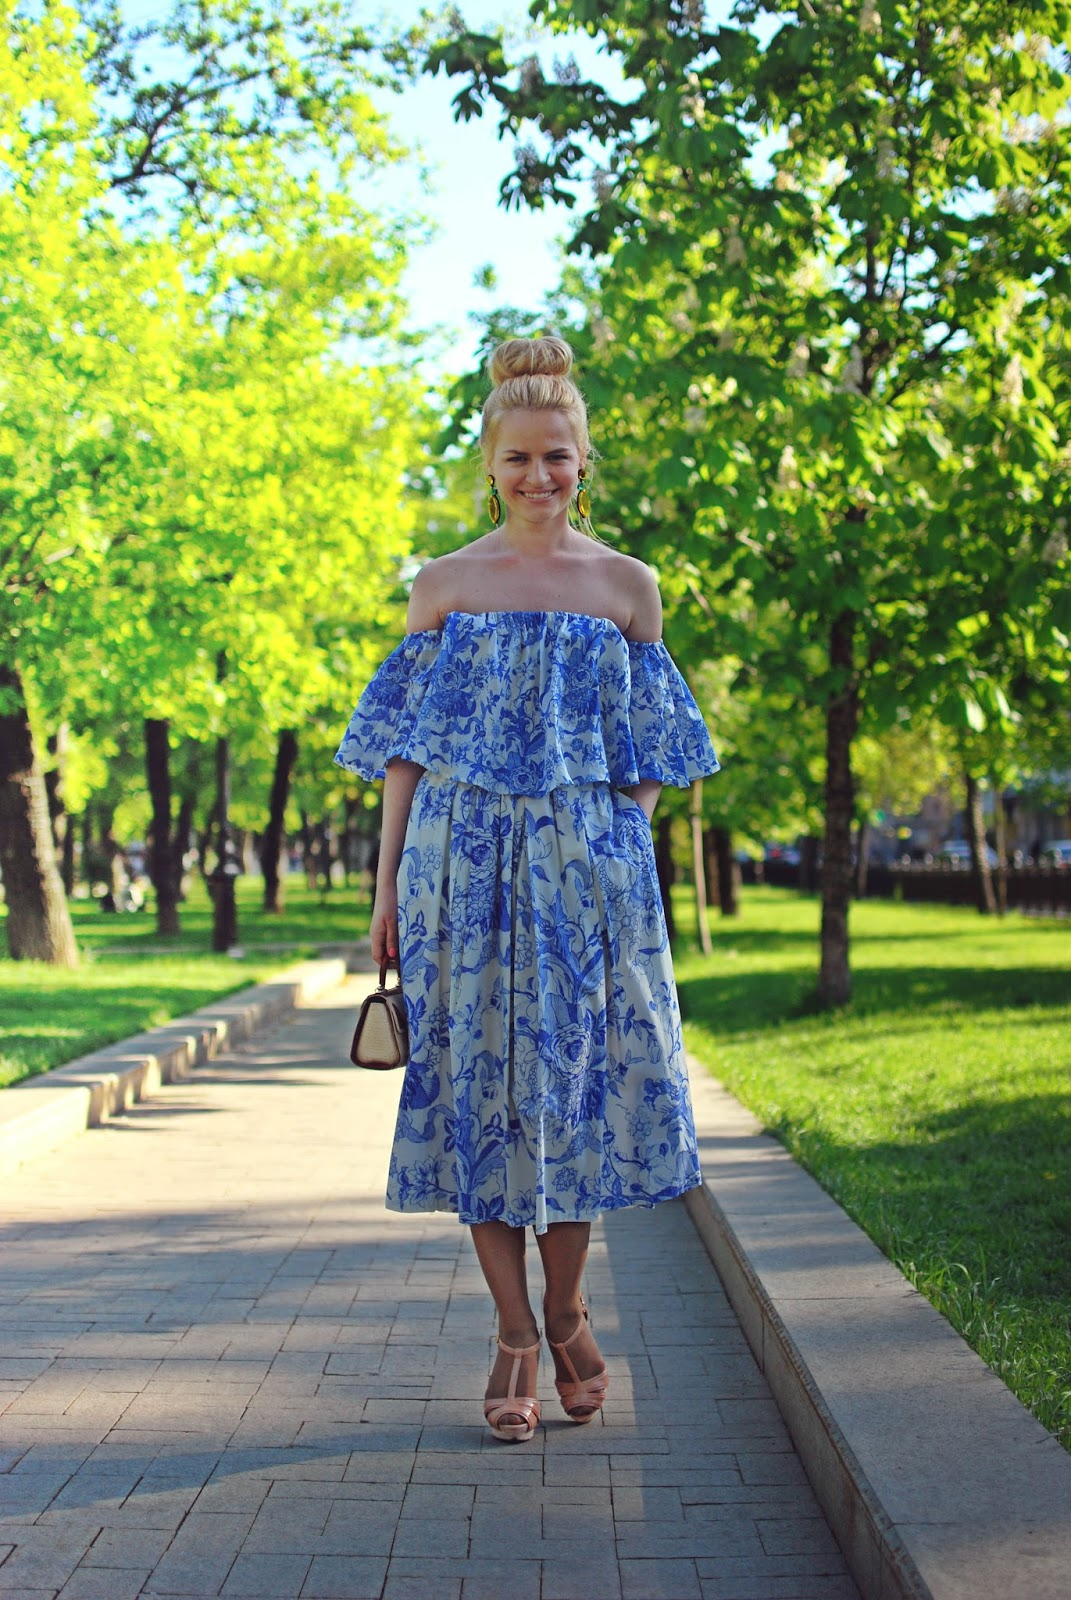 модные луки лета 2016, модное лето 2016, best fashion blog, lookbook,street fashion